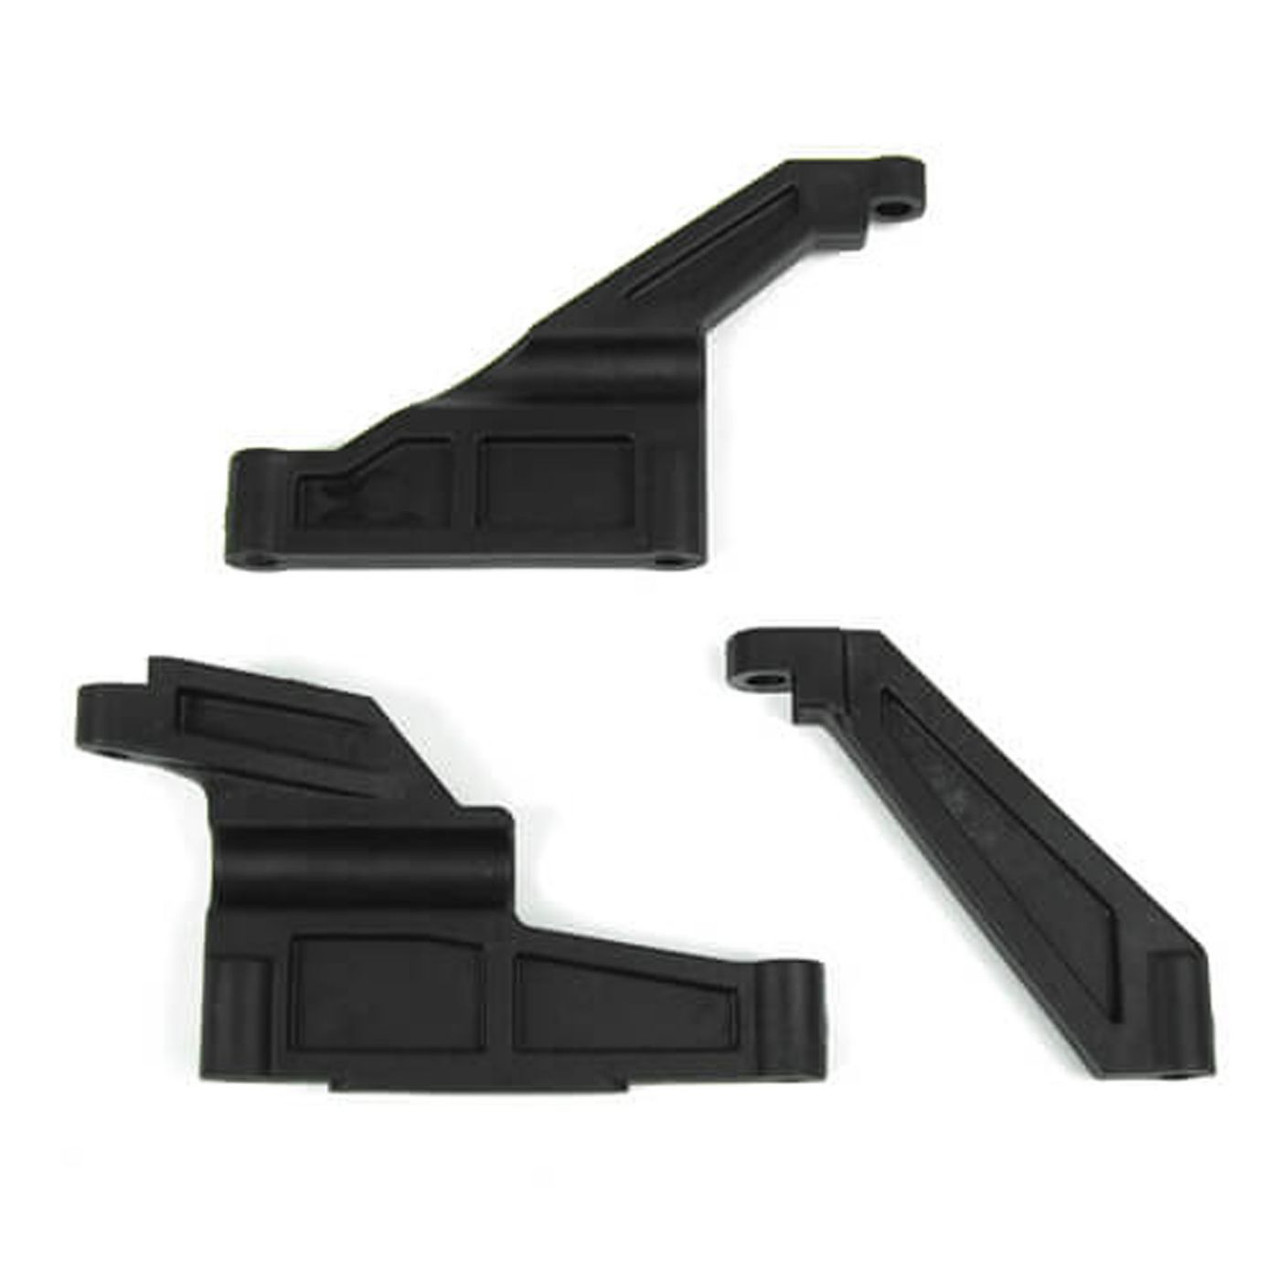 TEKNO RC LLC 5062 - Chassis Brace Set (Front, Rear, Center)